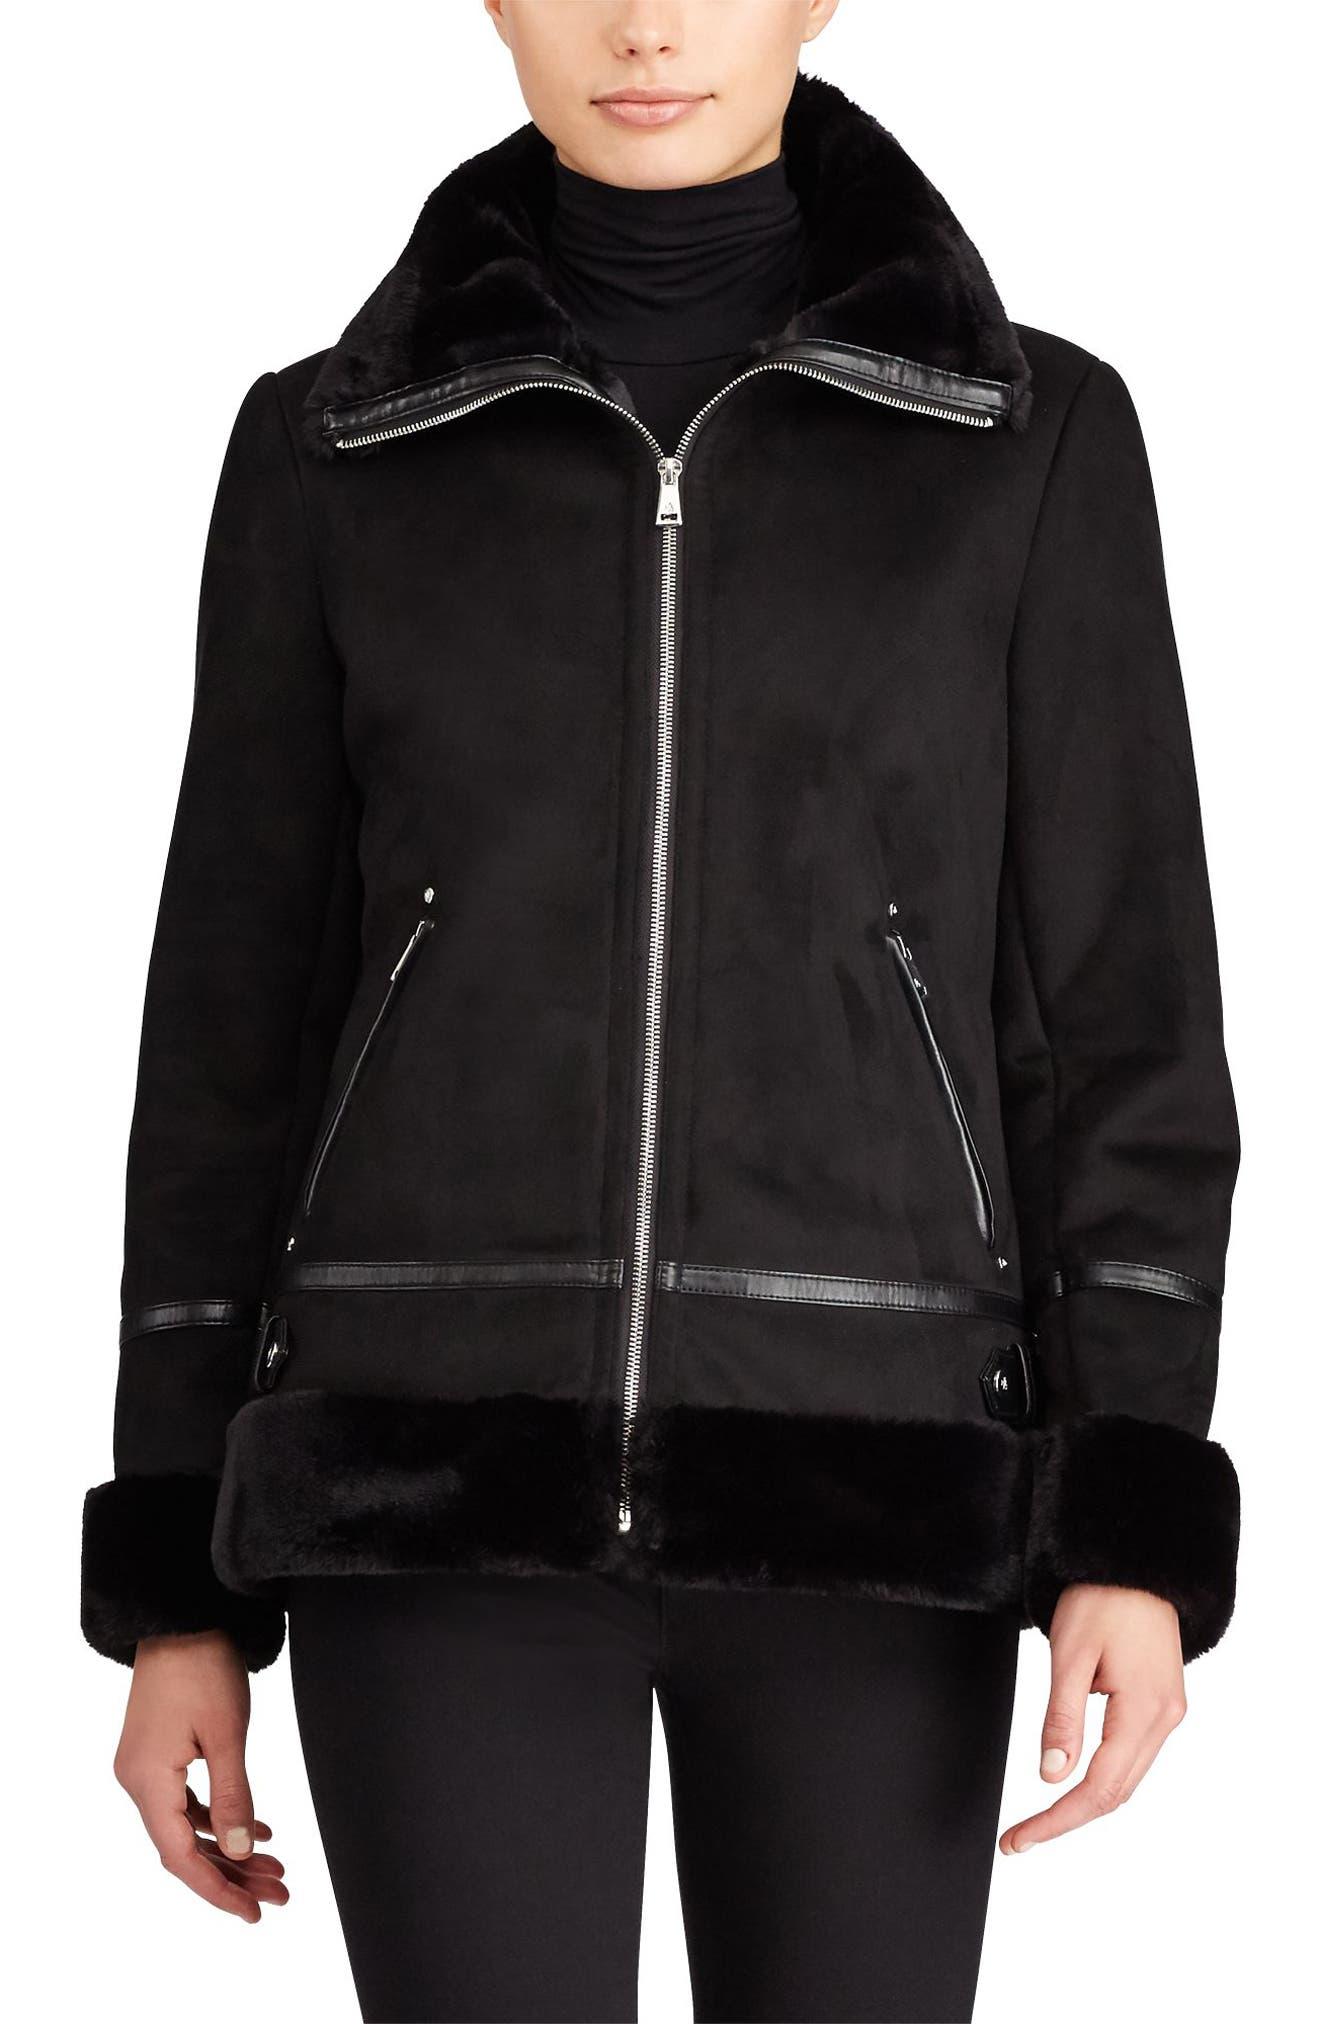 Alternate Image 1 Selected - Lauren Ralph Lauren Faux Shearling Bomber Jacket